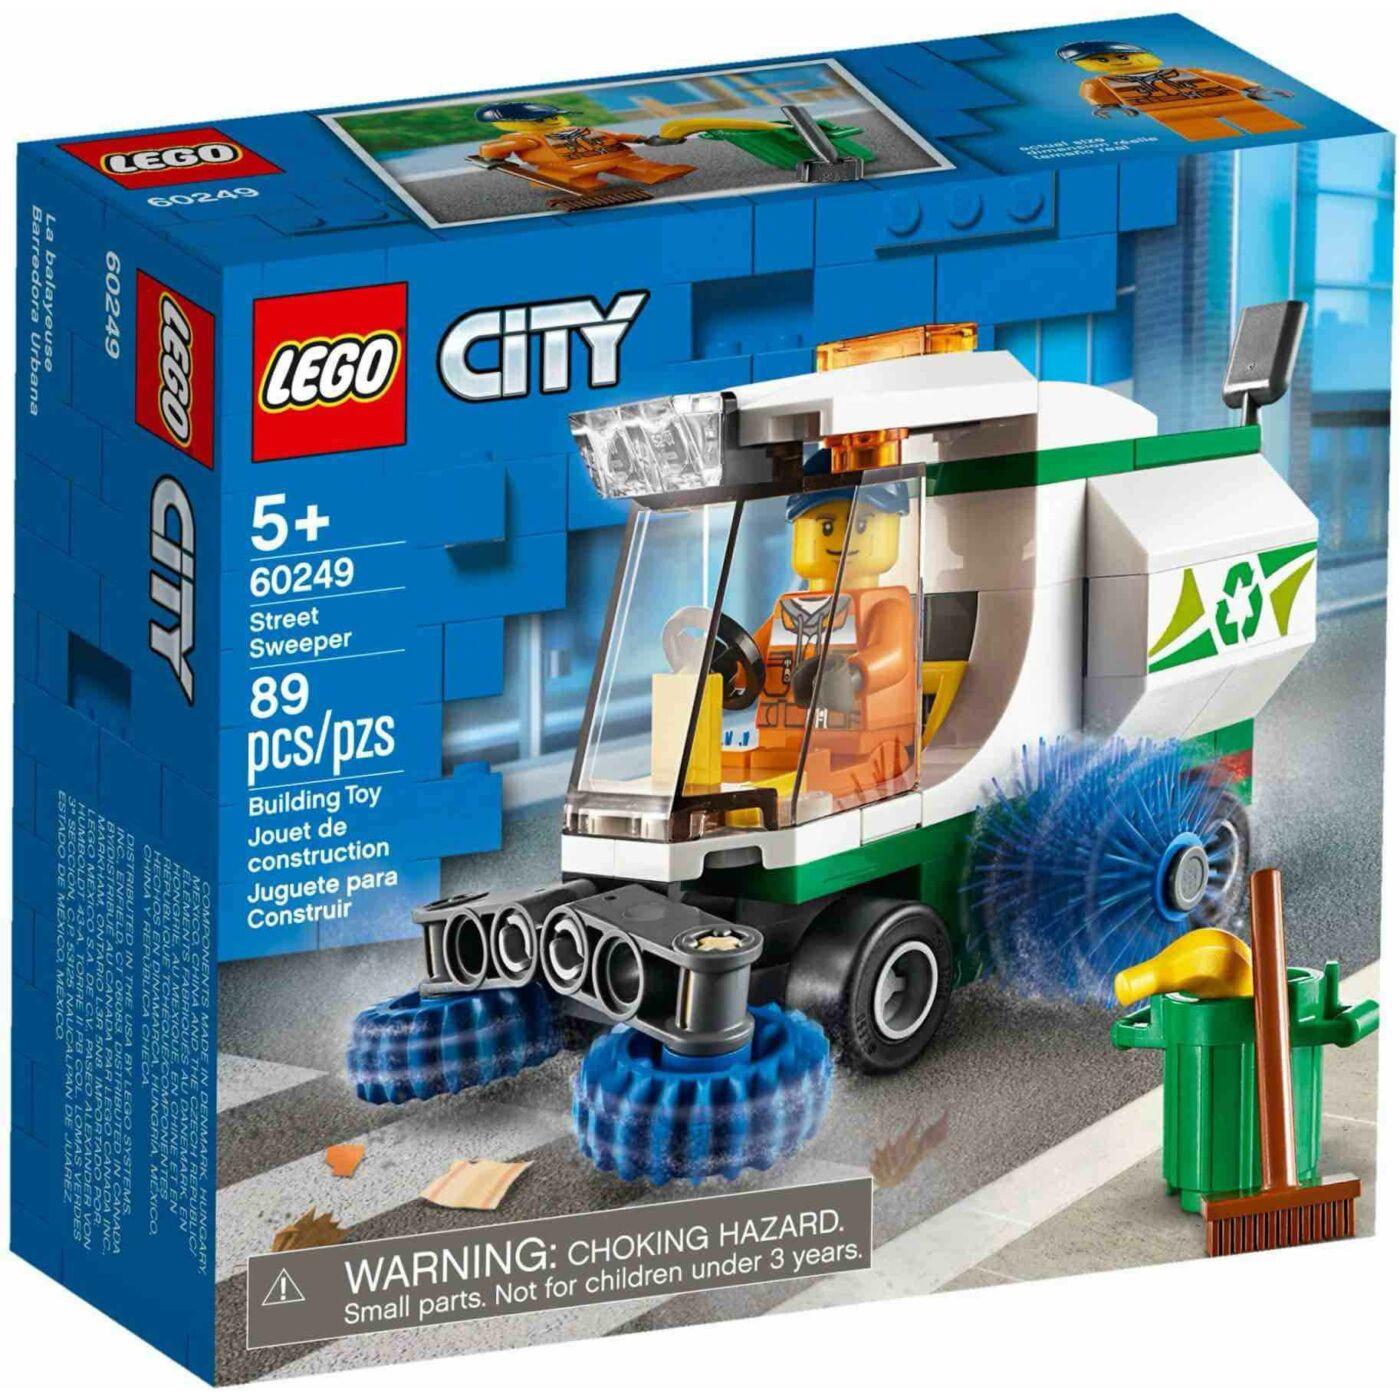 Lego City Utcaseprő gép